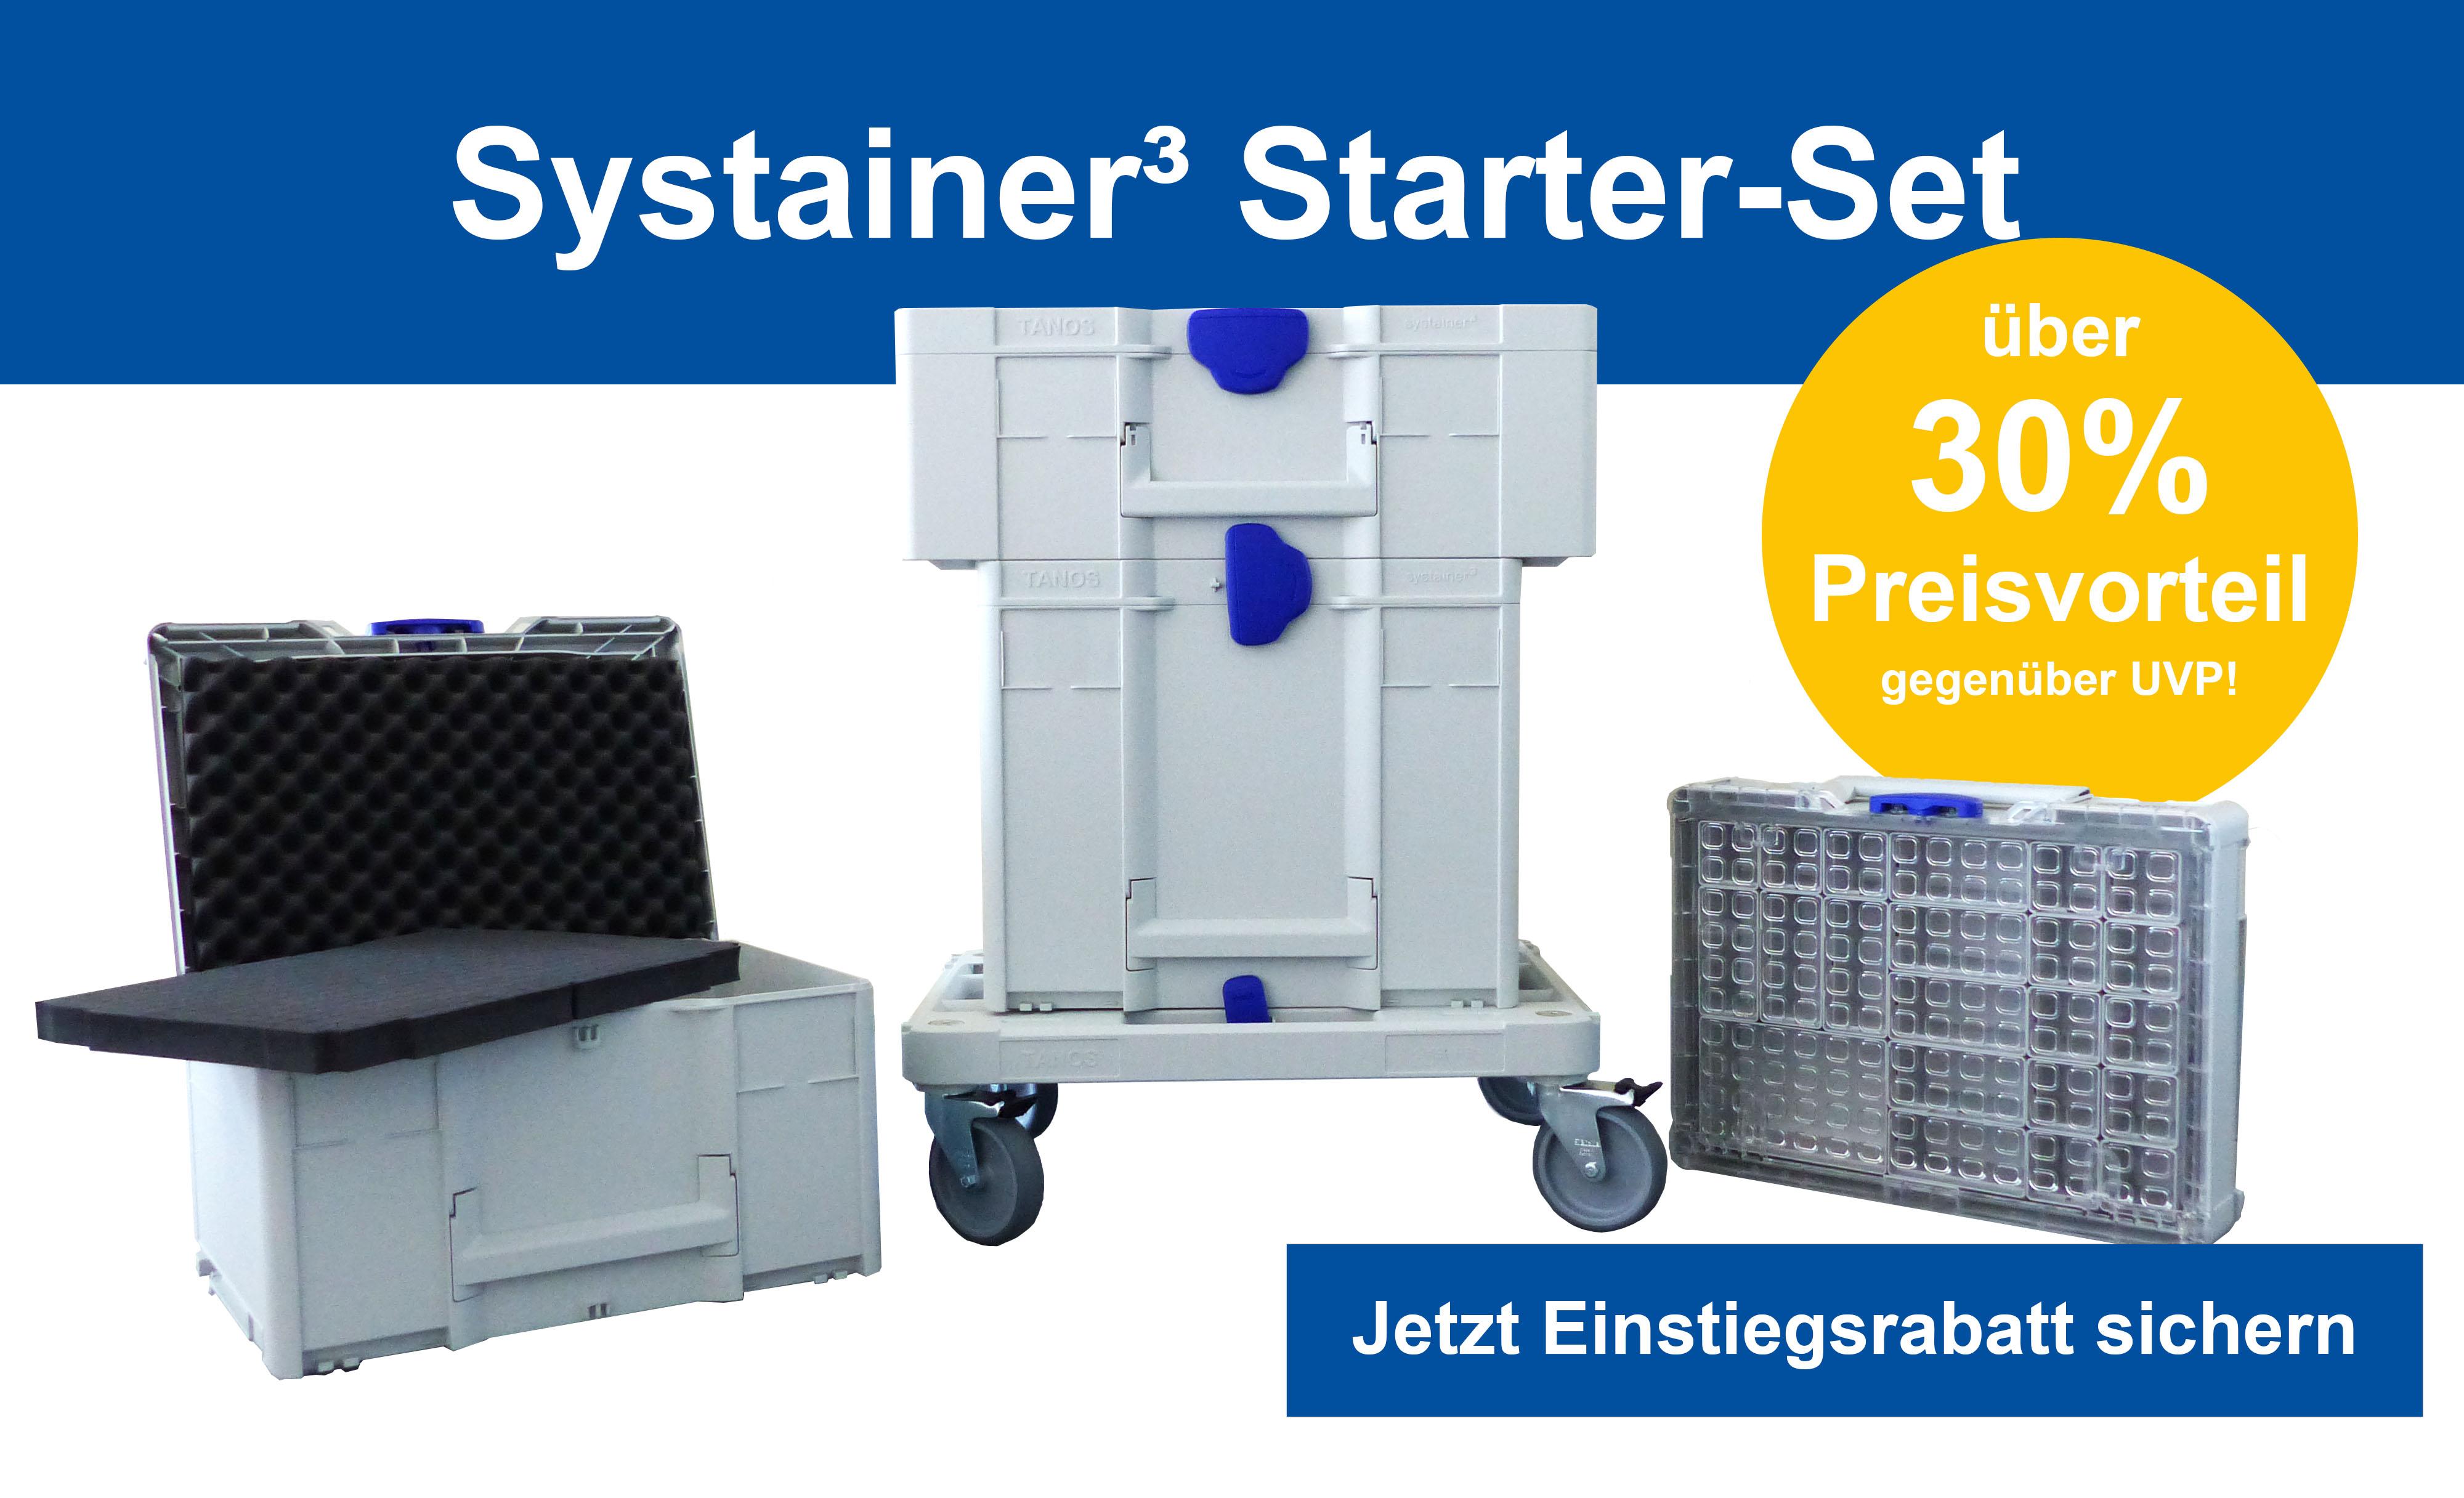 10% Rabatt bei Tanos (Der Systainer Hersteller für Festool, Mafell, Makita (Makpac) etc.)